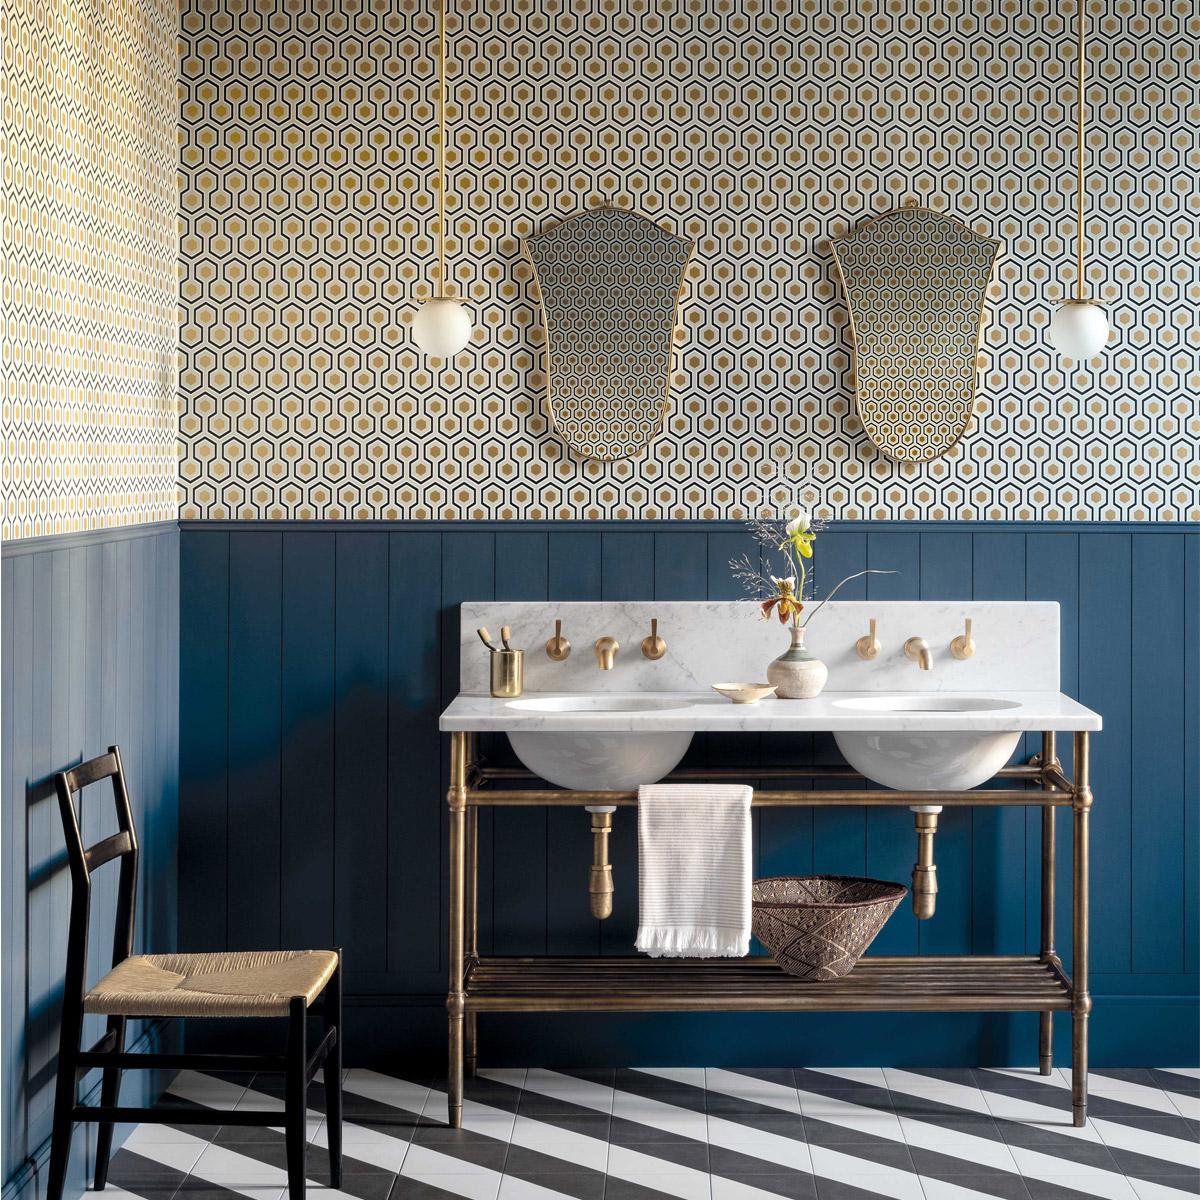 Using Wallpaper In Your Bathroom   Beut Blog